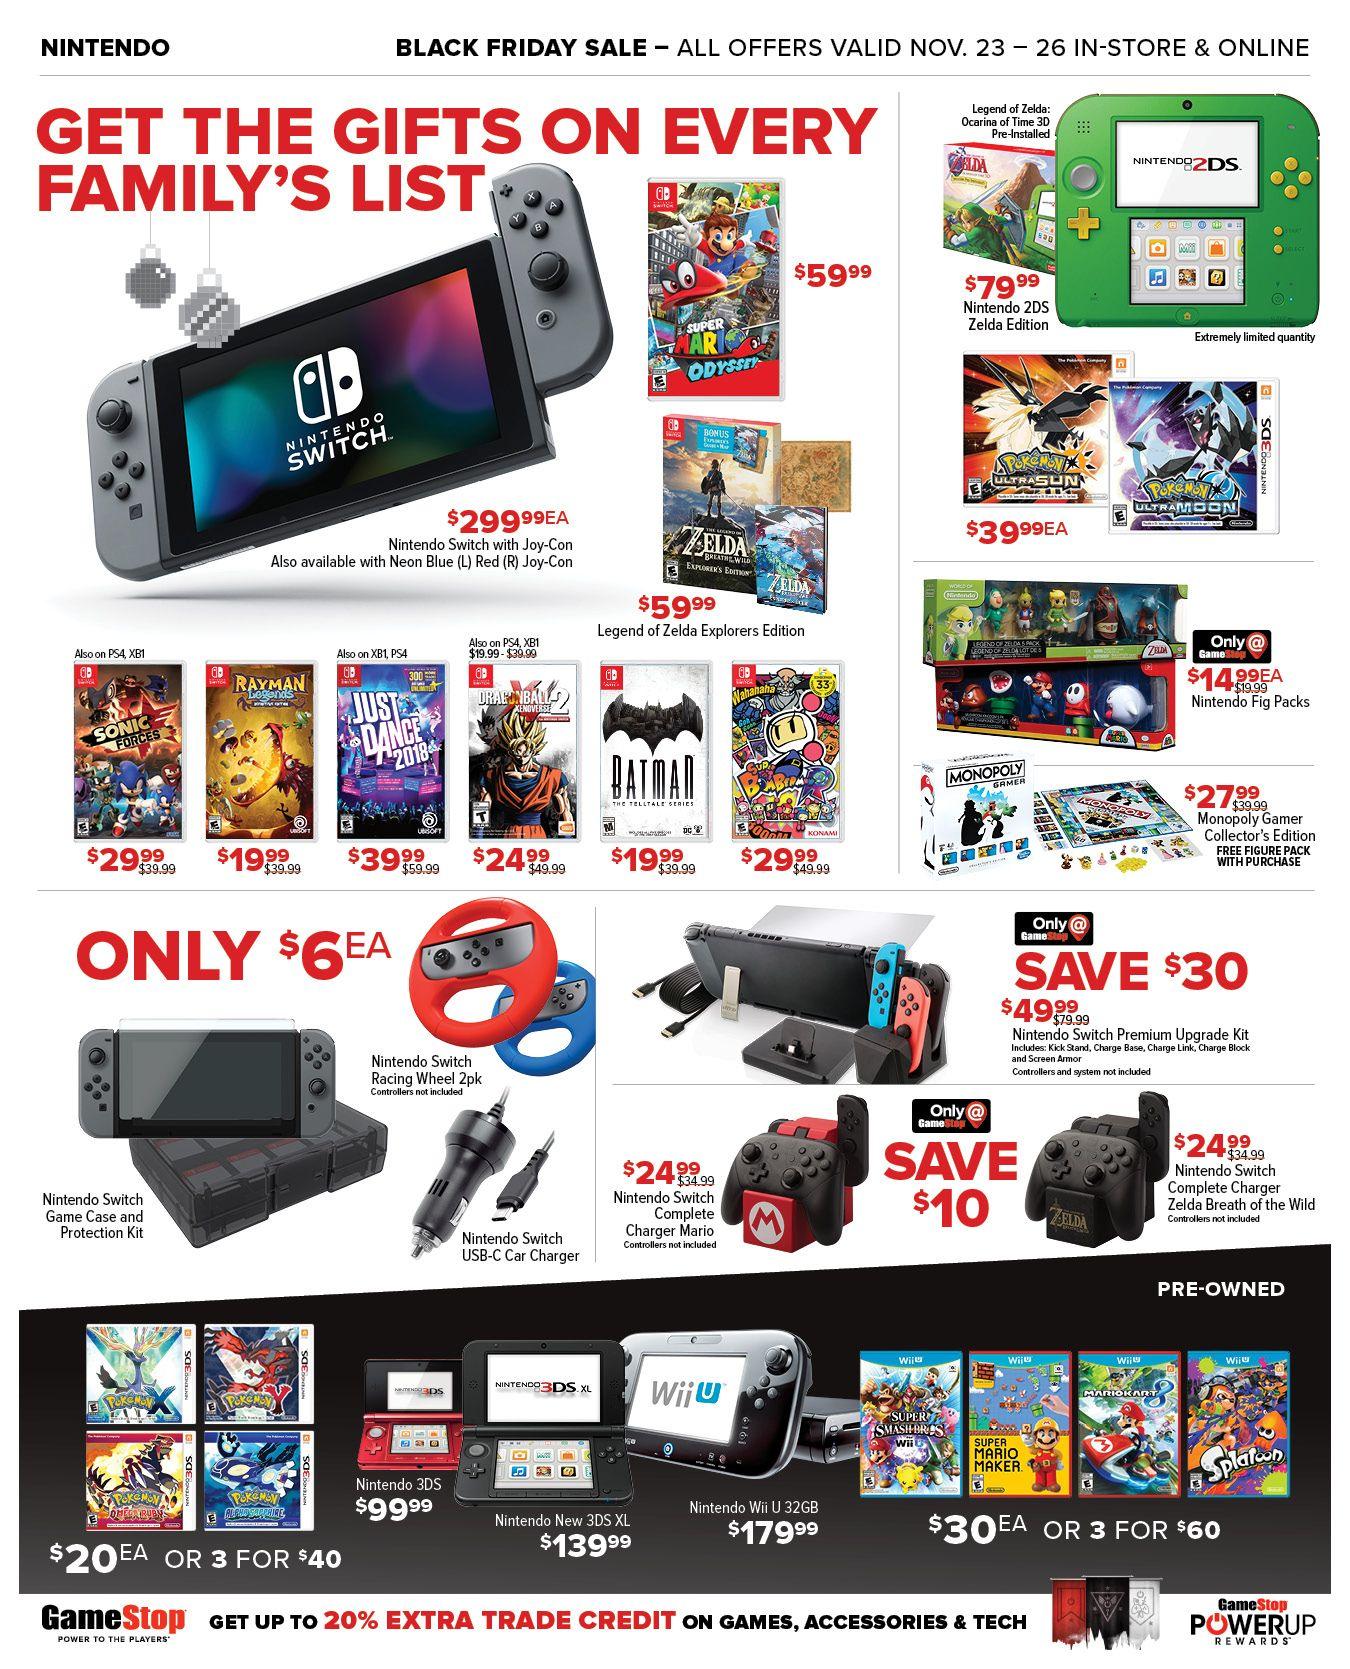 2017 Black Friday Deals Sales On Video Games Consoles More Gamestop Black Friday Games To Play Now Nintendo